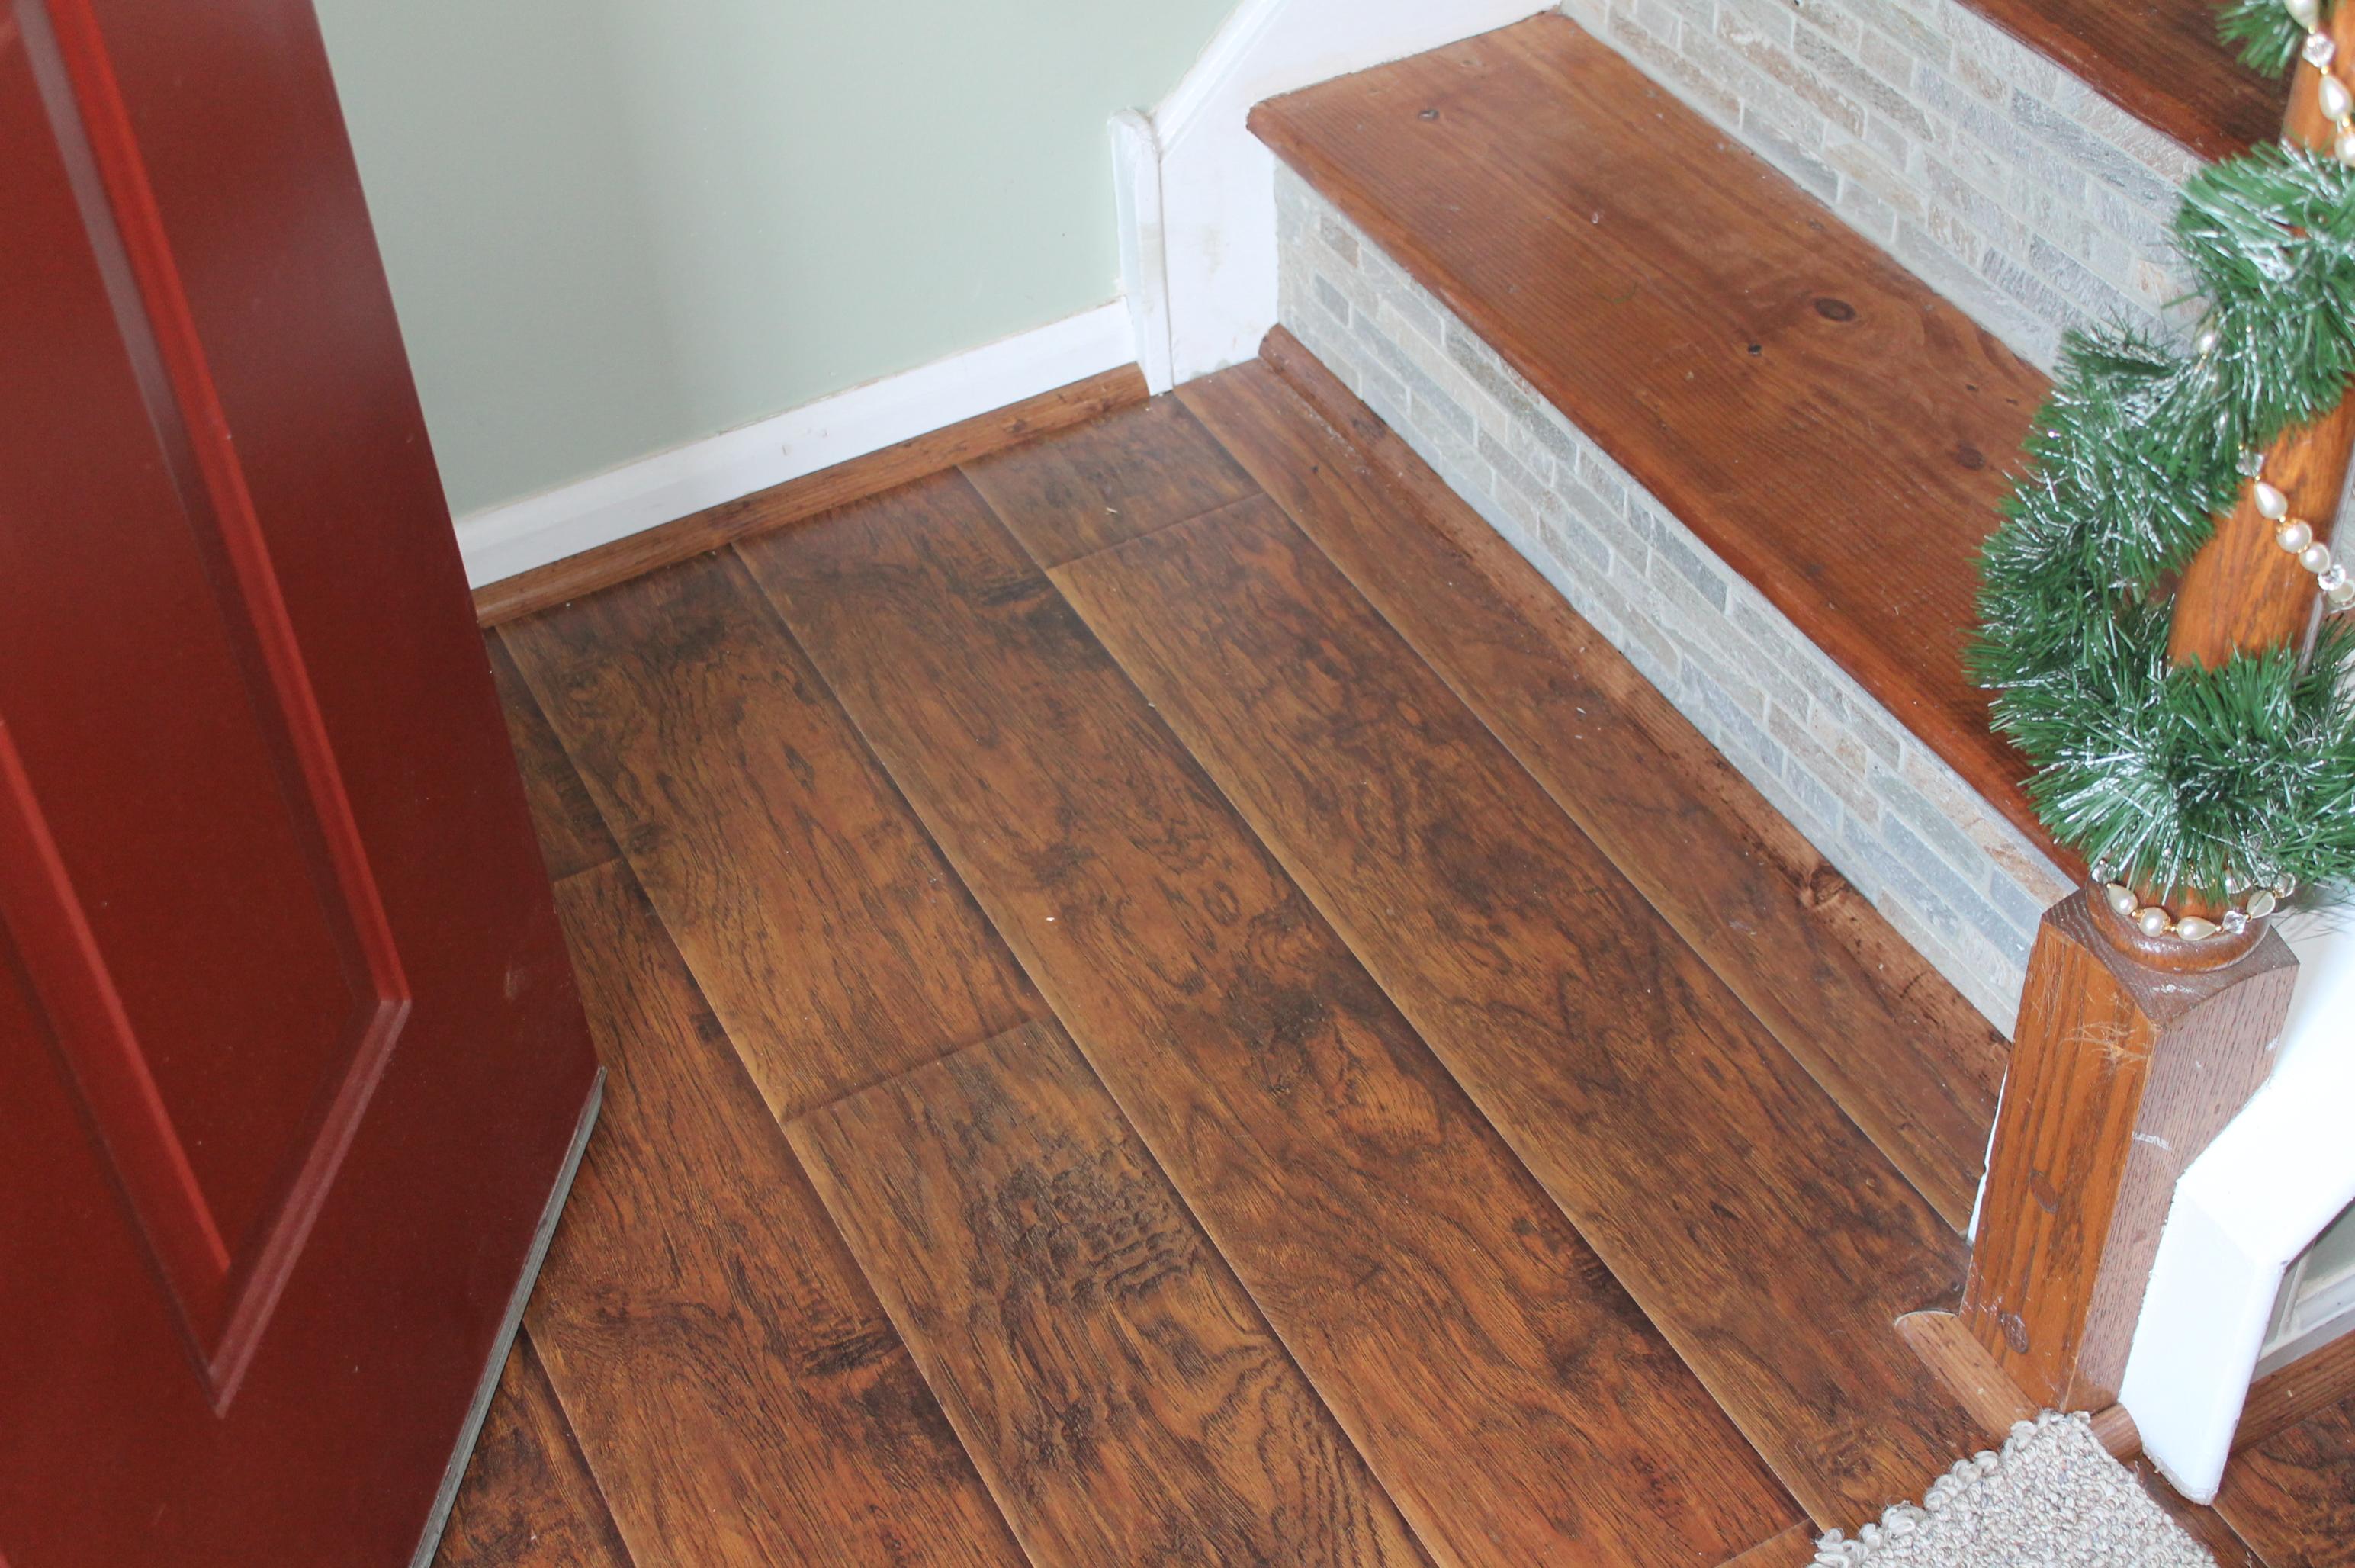 Laminate Floor & Stairs